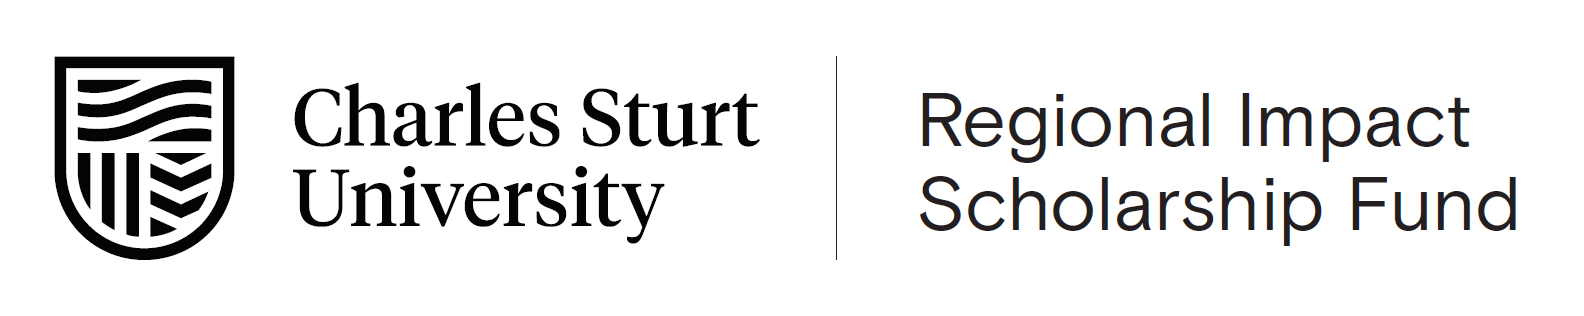 Regional Impact Scholarship Fund